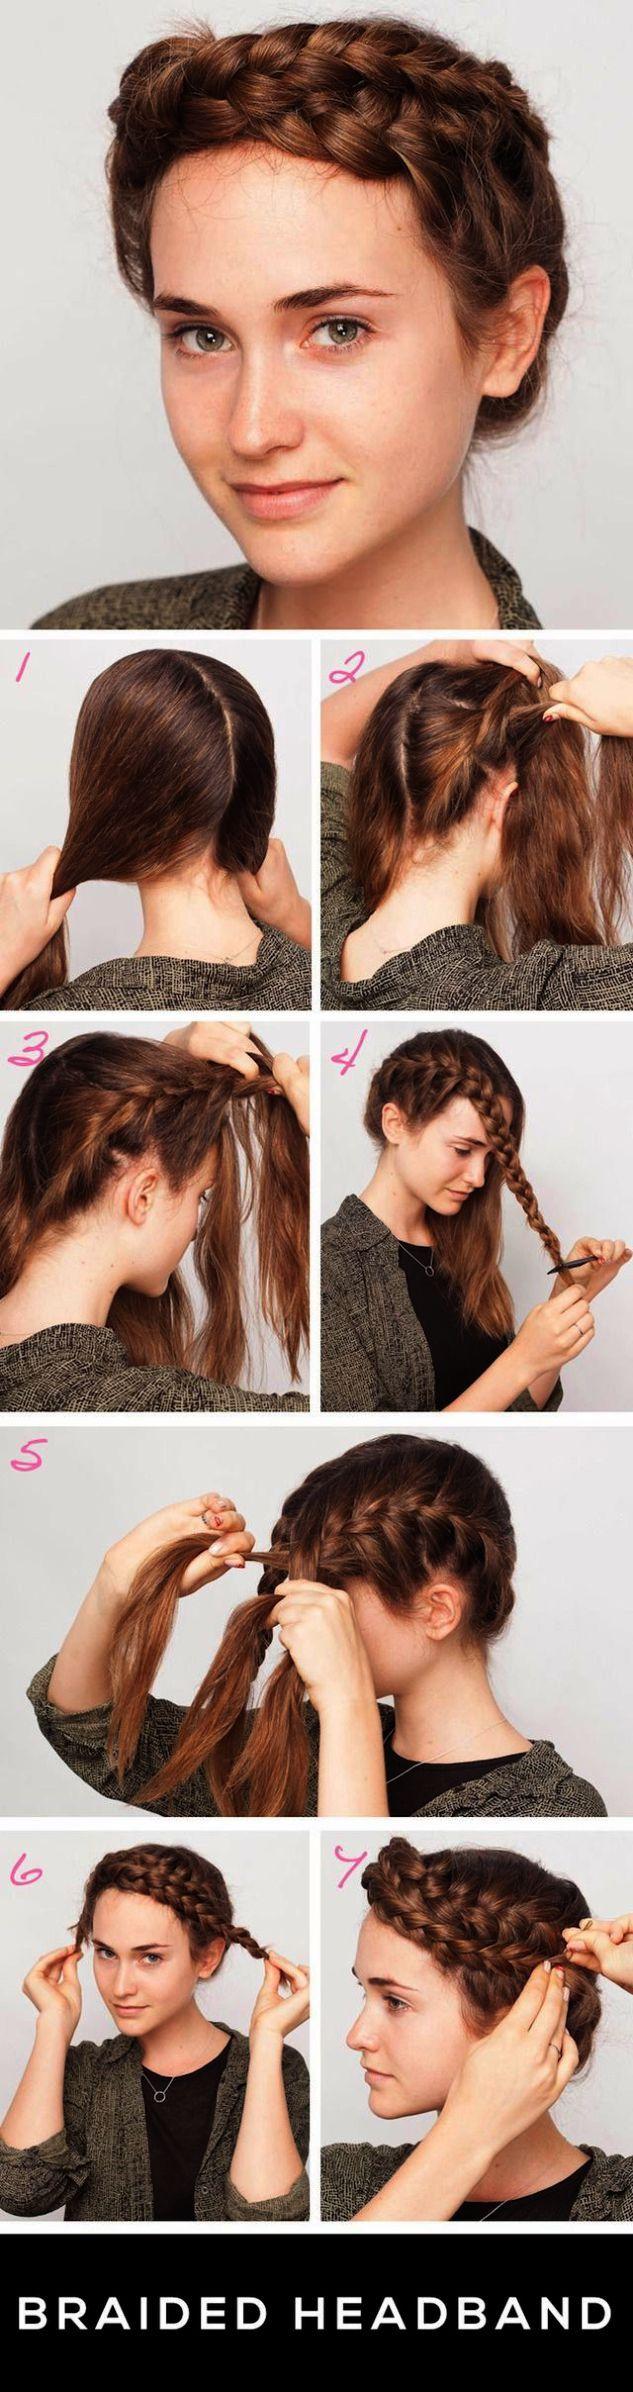 Hair Extensions Blonde or Hairspray National Tour where Hair Extensions Expensive to Haircut Near Me Cheap against Hairspray Face Shield